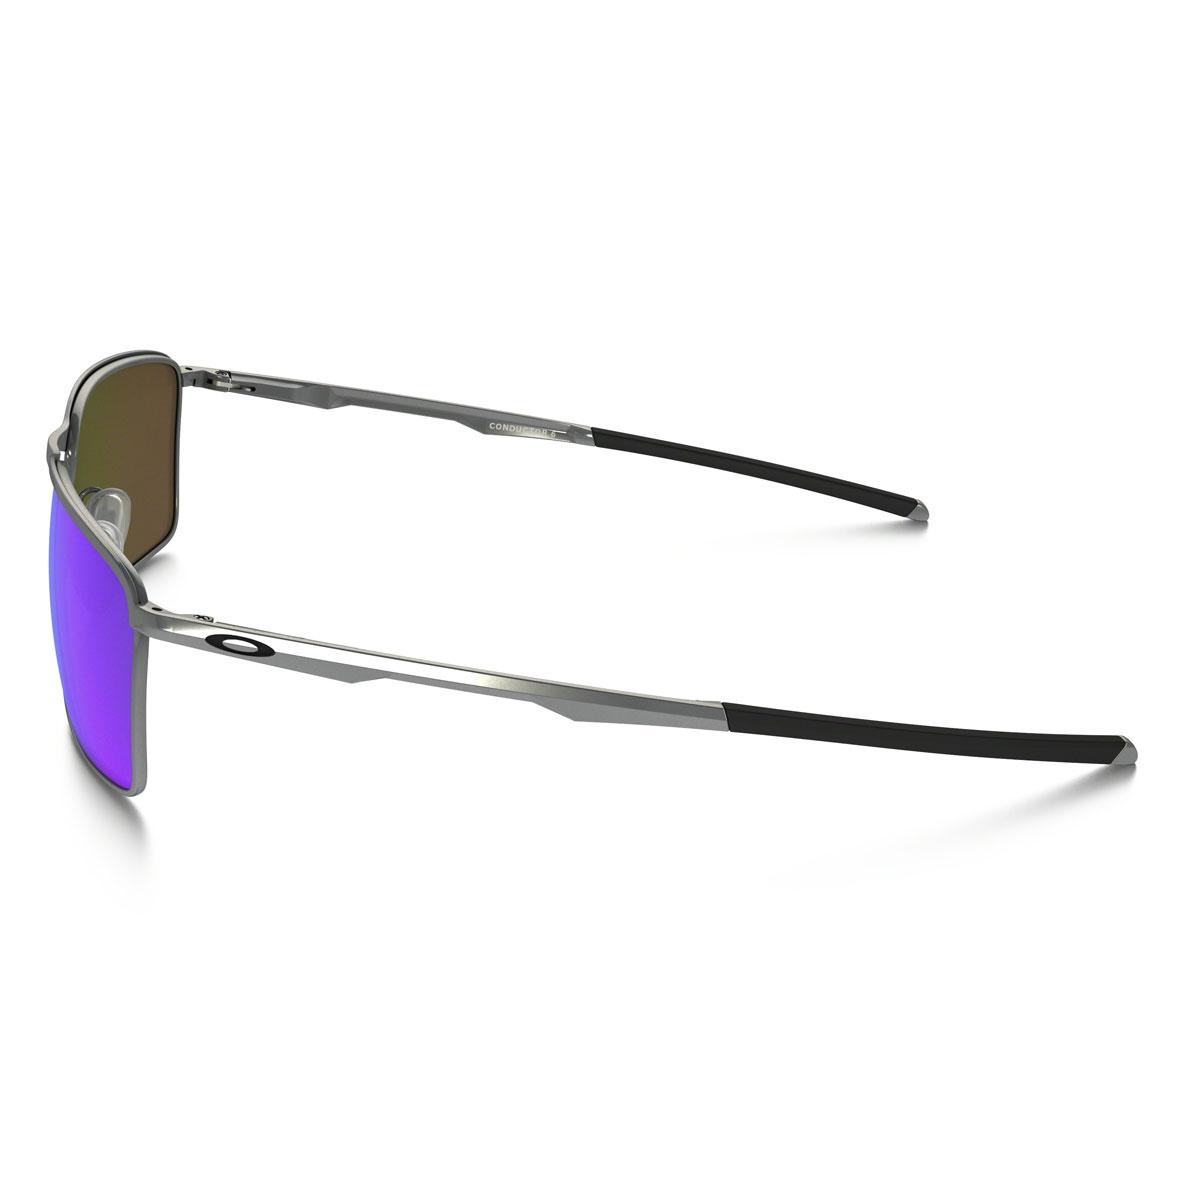 617a1a1ce5 ... Image of Oakley Conductor 6 Sunglasses - Lead Frame Sapphire Iridium  Lens